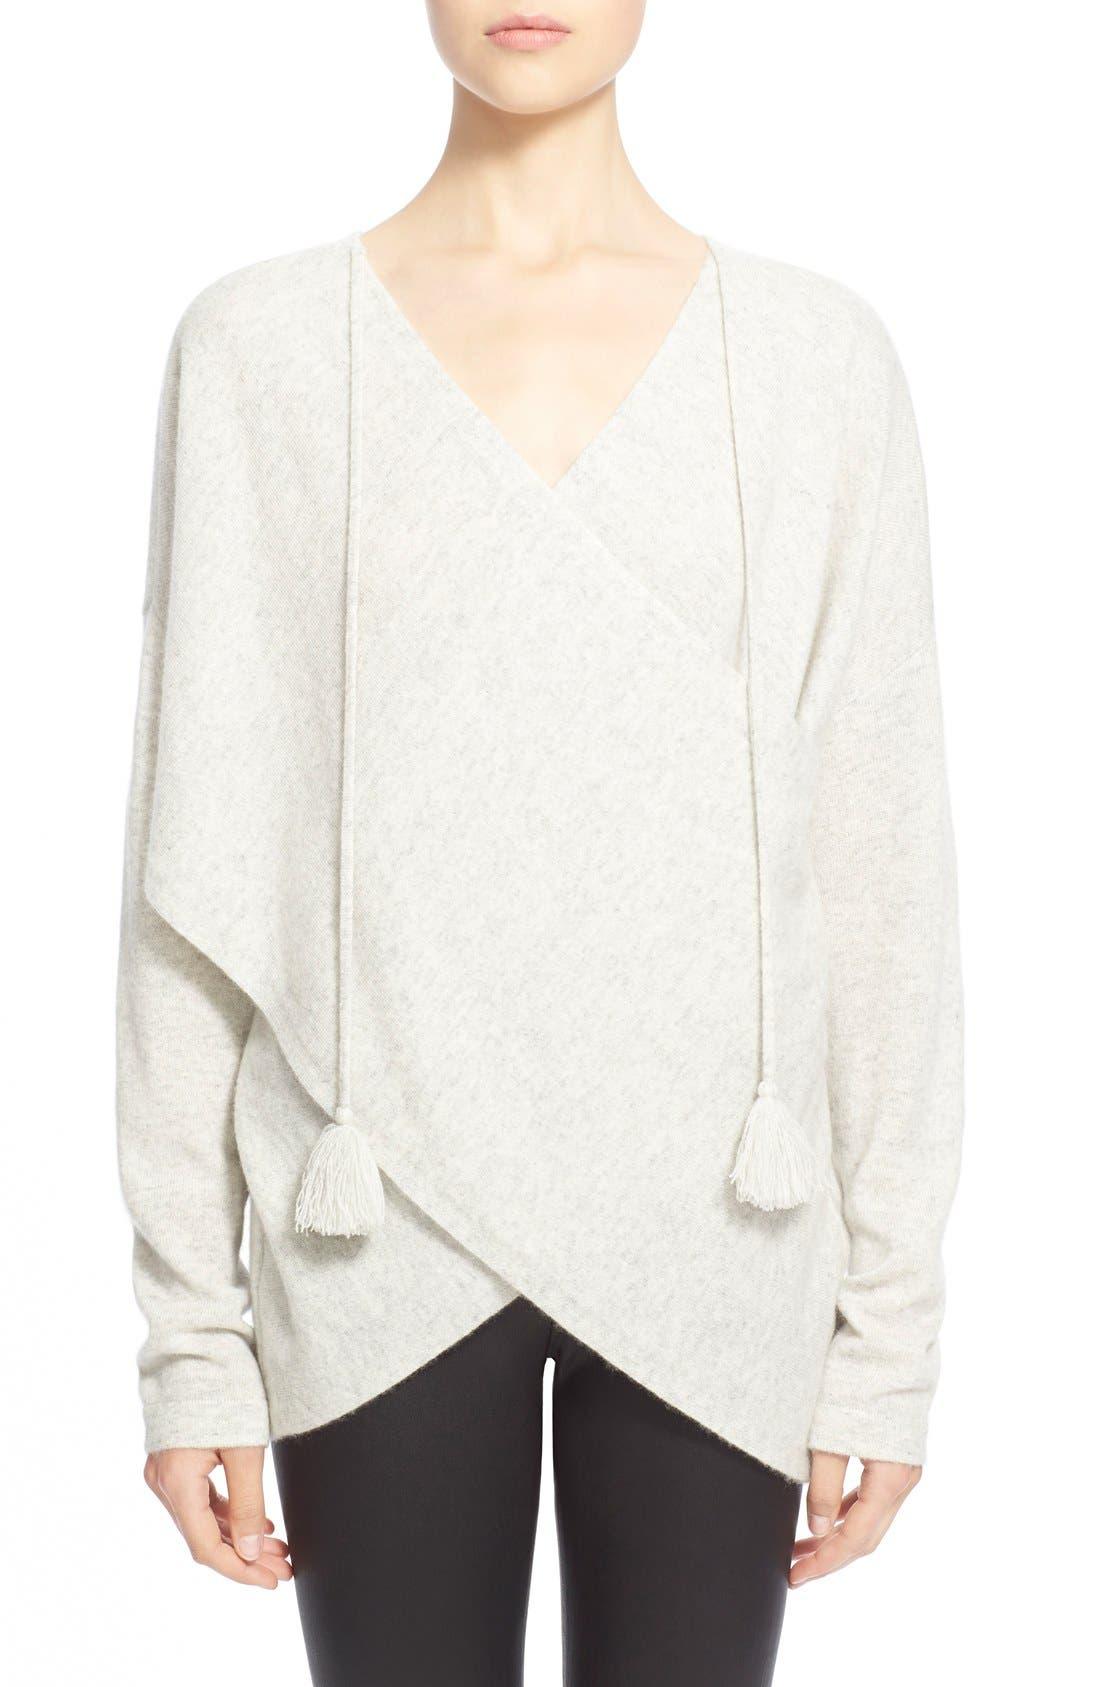 Alternate Image 1 Selected - Derek Lam 10 Crosby Tasseled Cross Front Cashmere Sweater